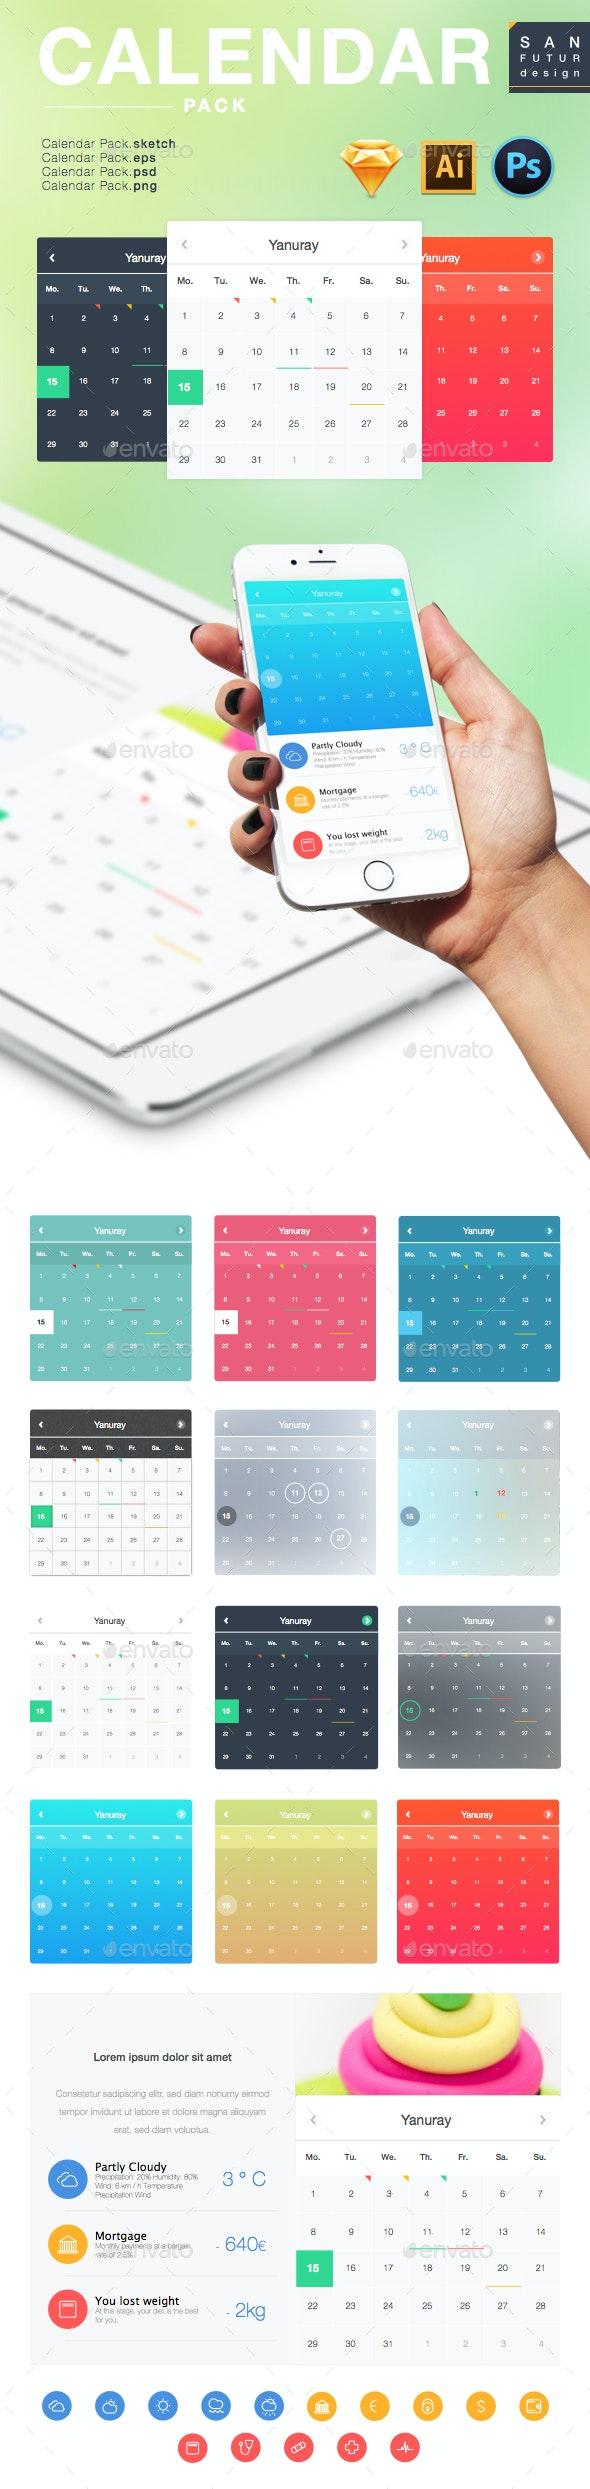 Calendar Pack (Flat,Gradient) - Miscellaneous Social Media